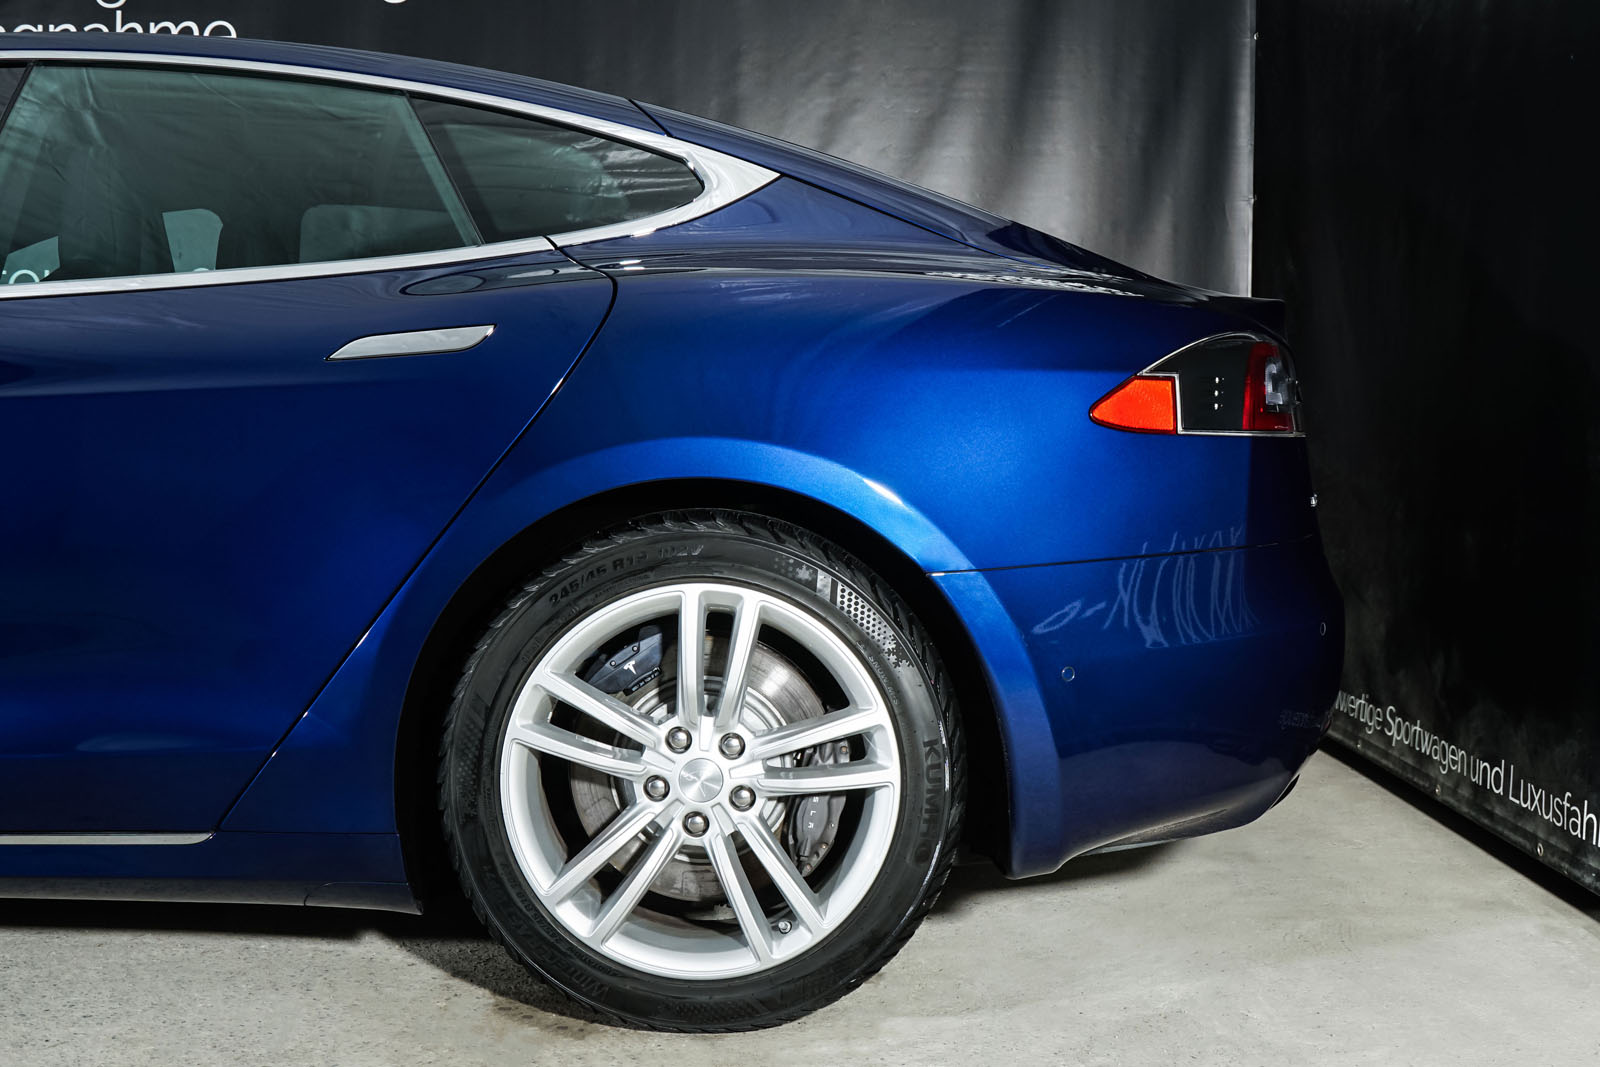 Tesla_ModelS_90D_Blau_Schwarz_Tes-0513_4_w